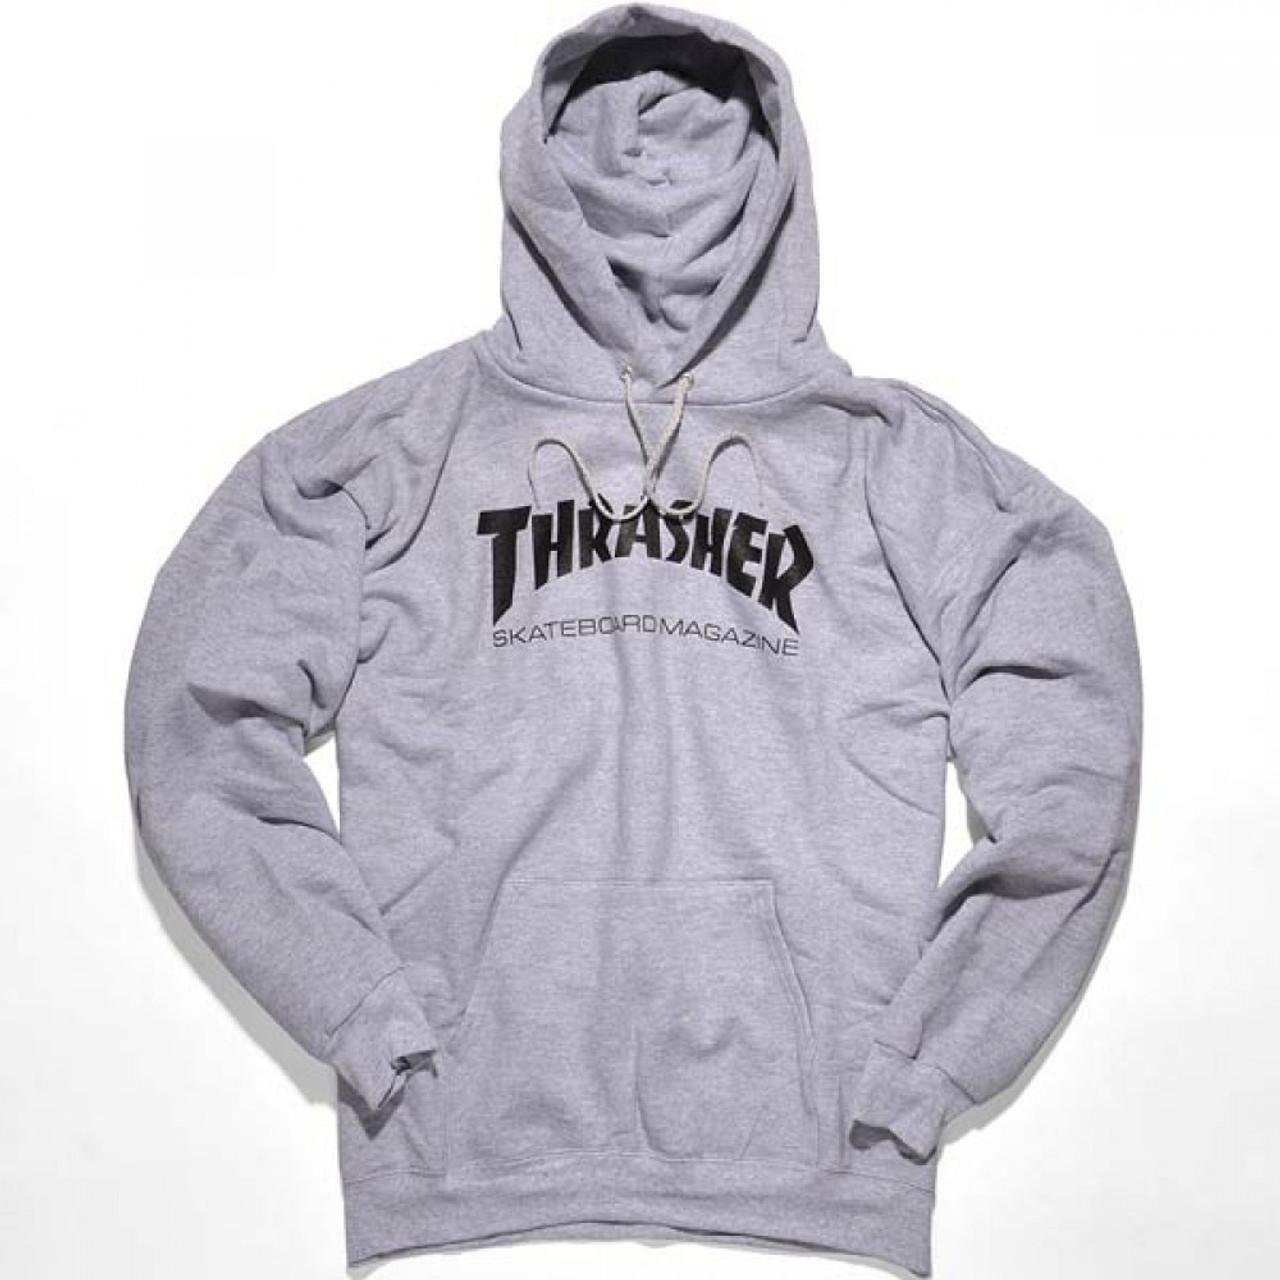 9a1d74720a54 Thrasher Skate Mag Hoodie Grey Black Xl